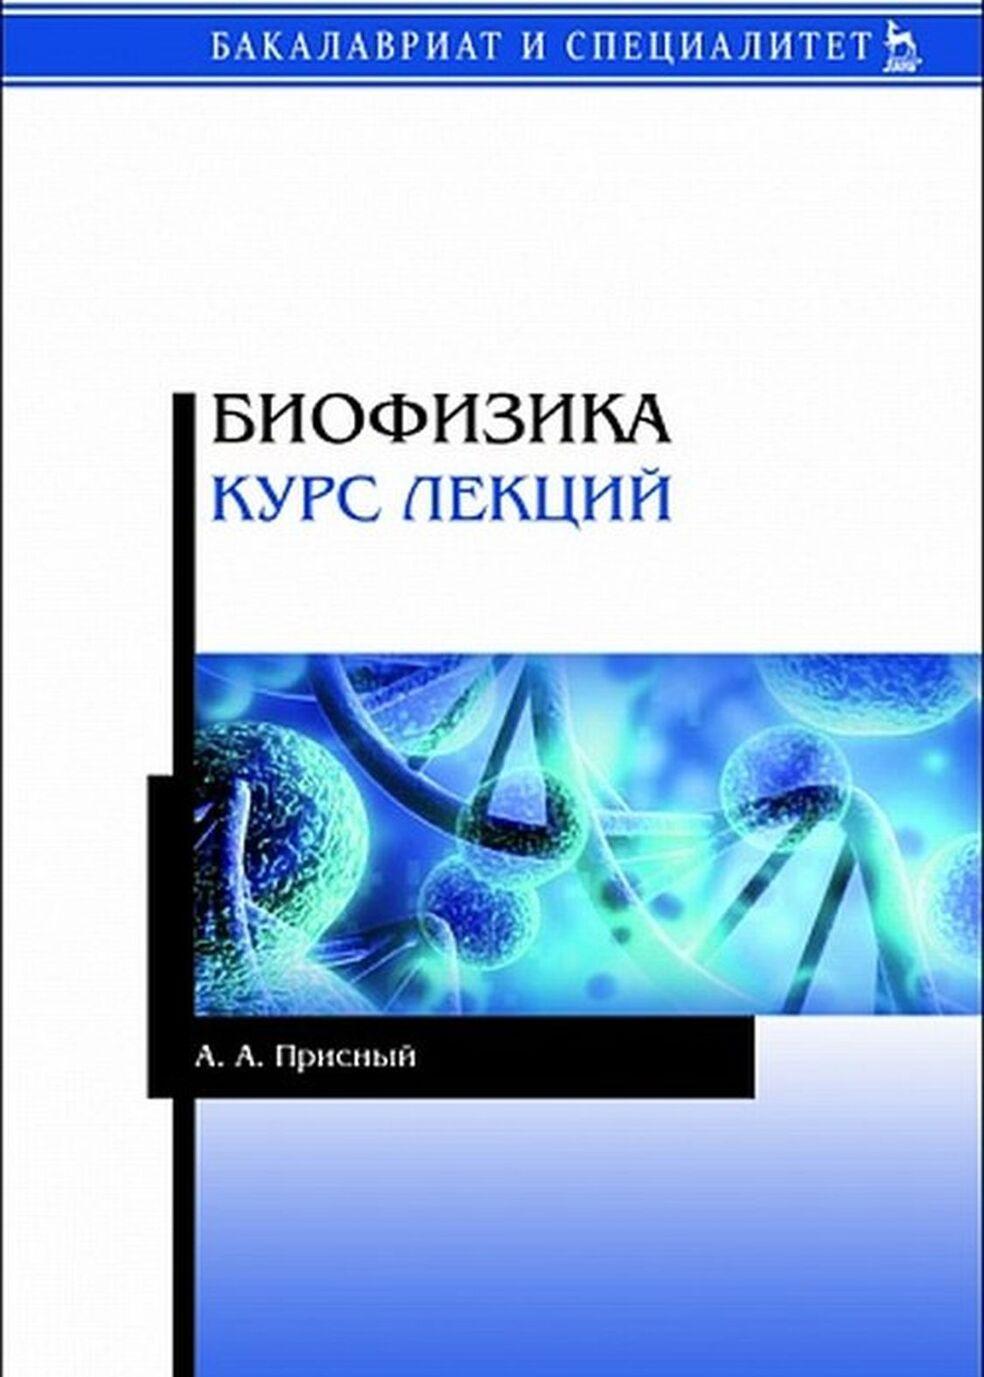 Биофизика. Курс лекций